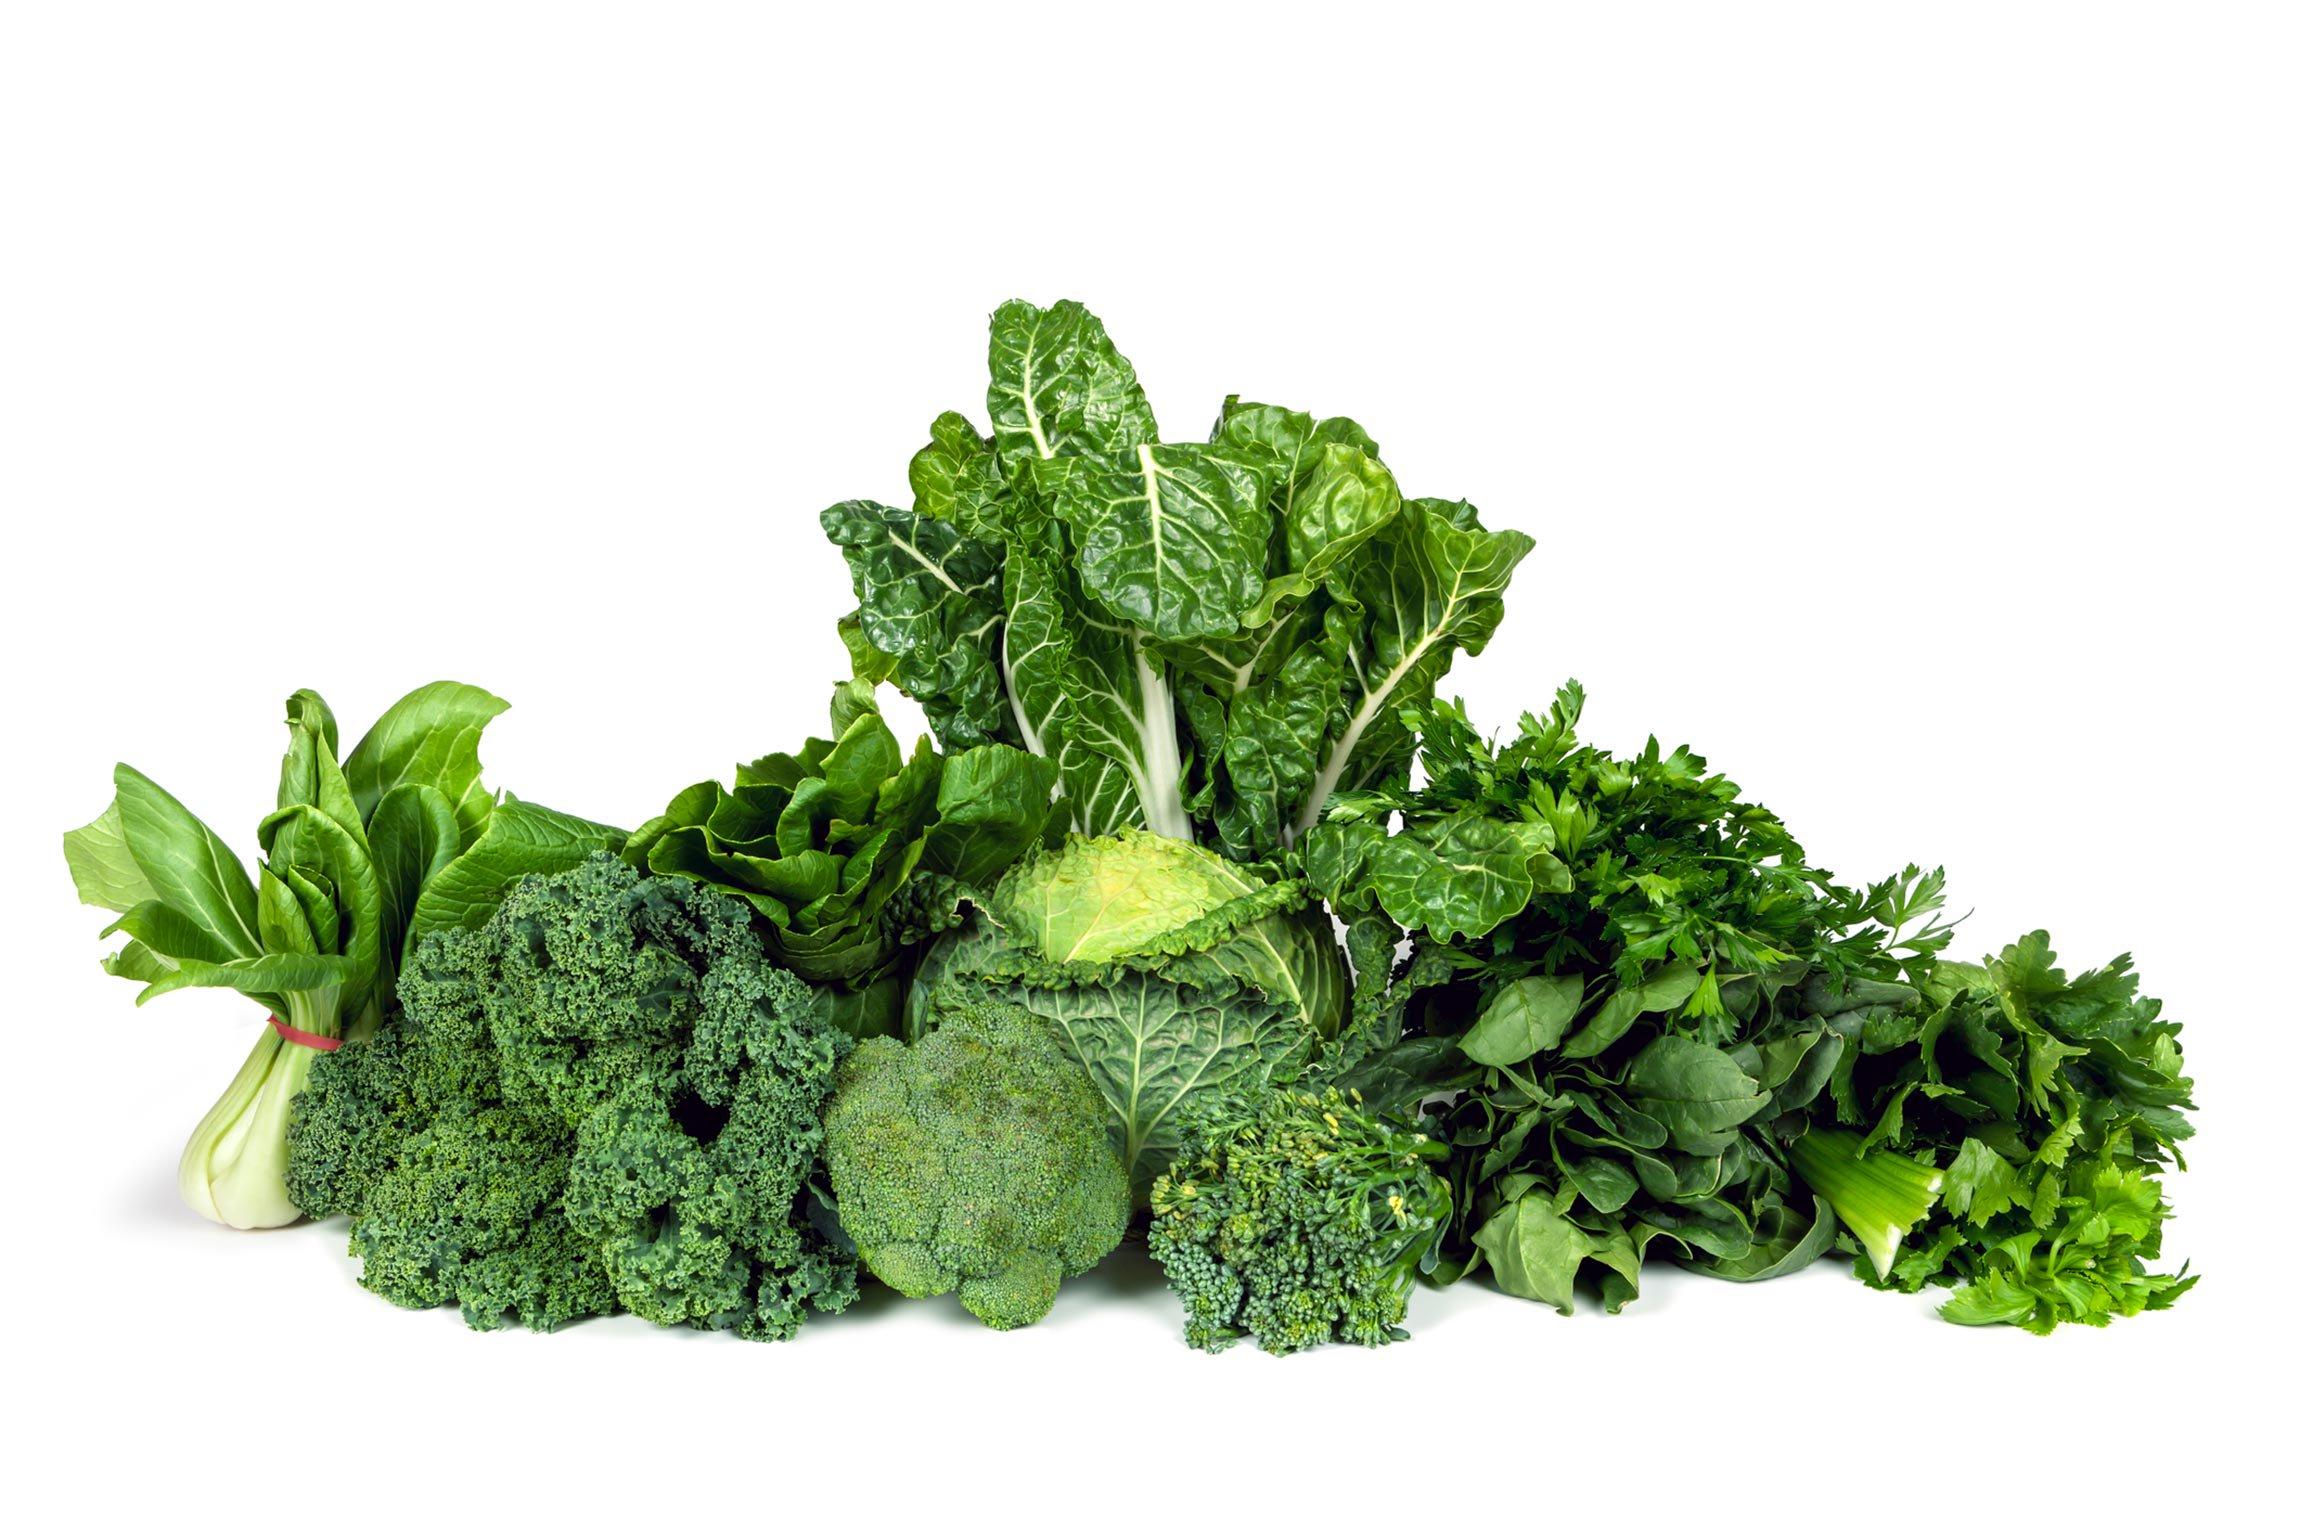 display of green vegetables